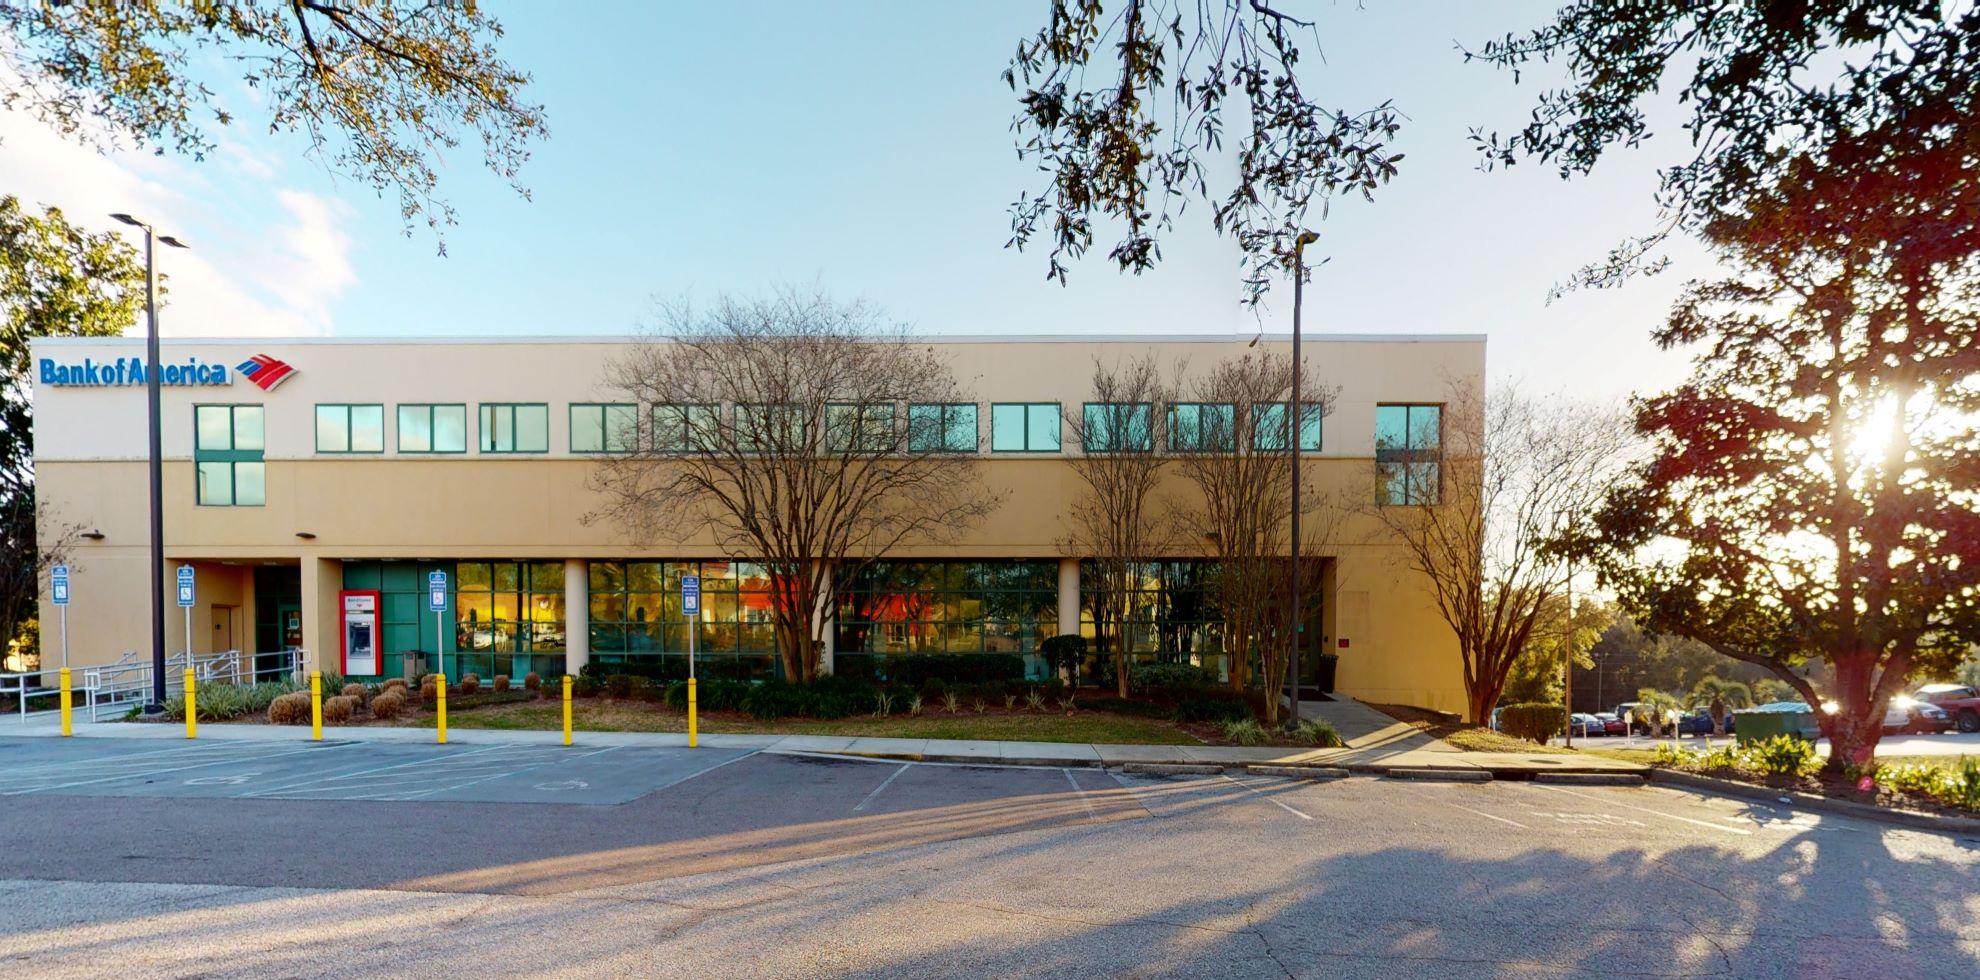 Bank of America financial center with drive-thru ATM   5041 Bayou Blvd, Pensacola, FL 32503